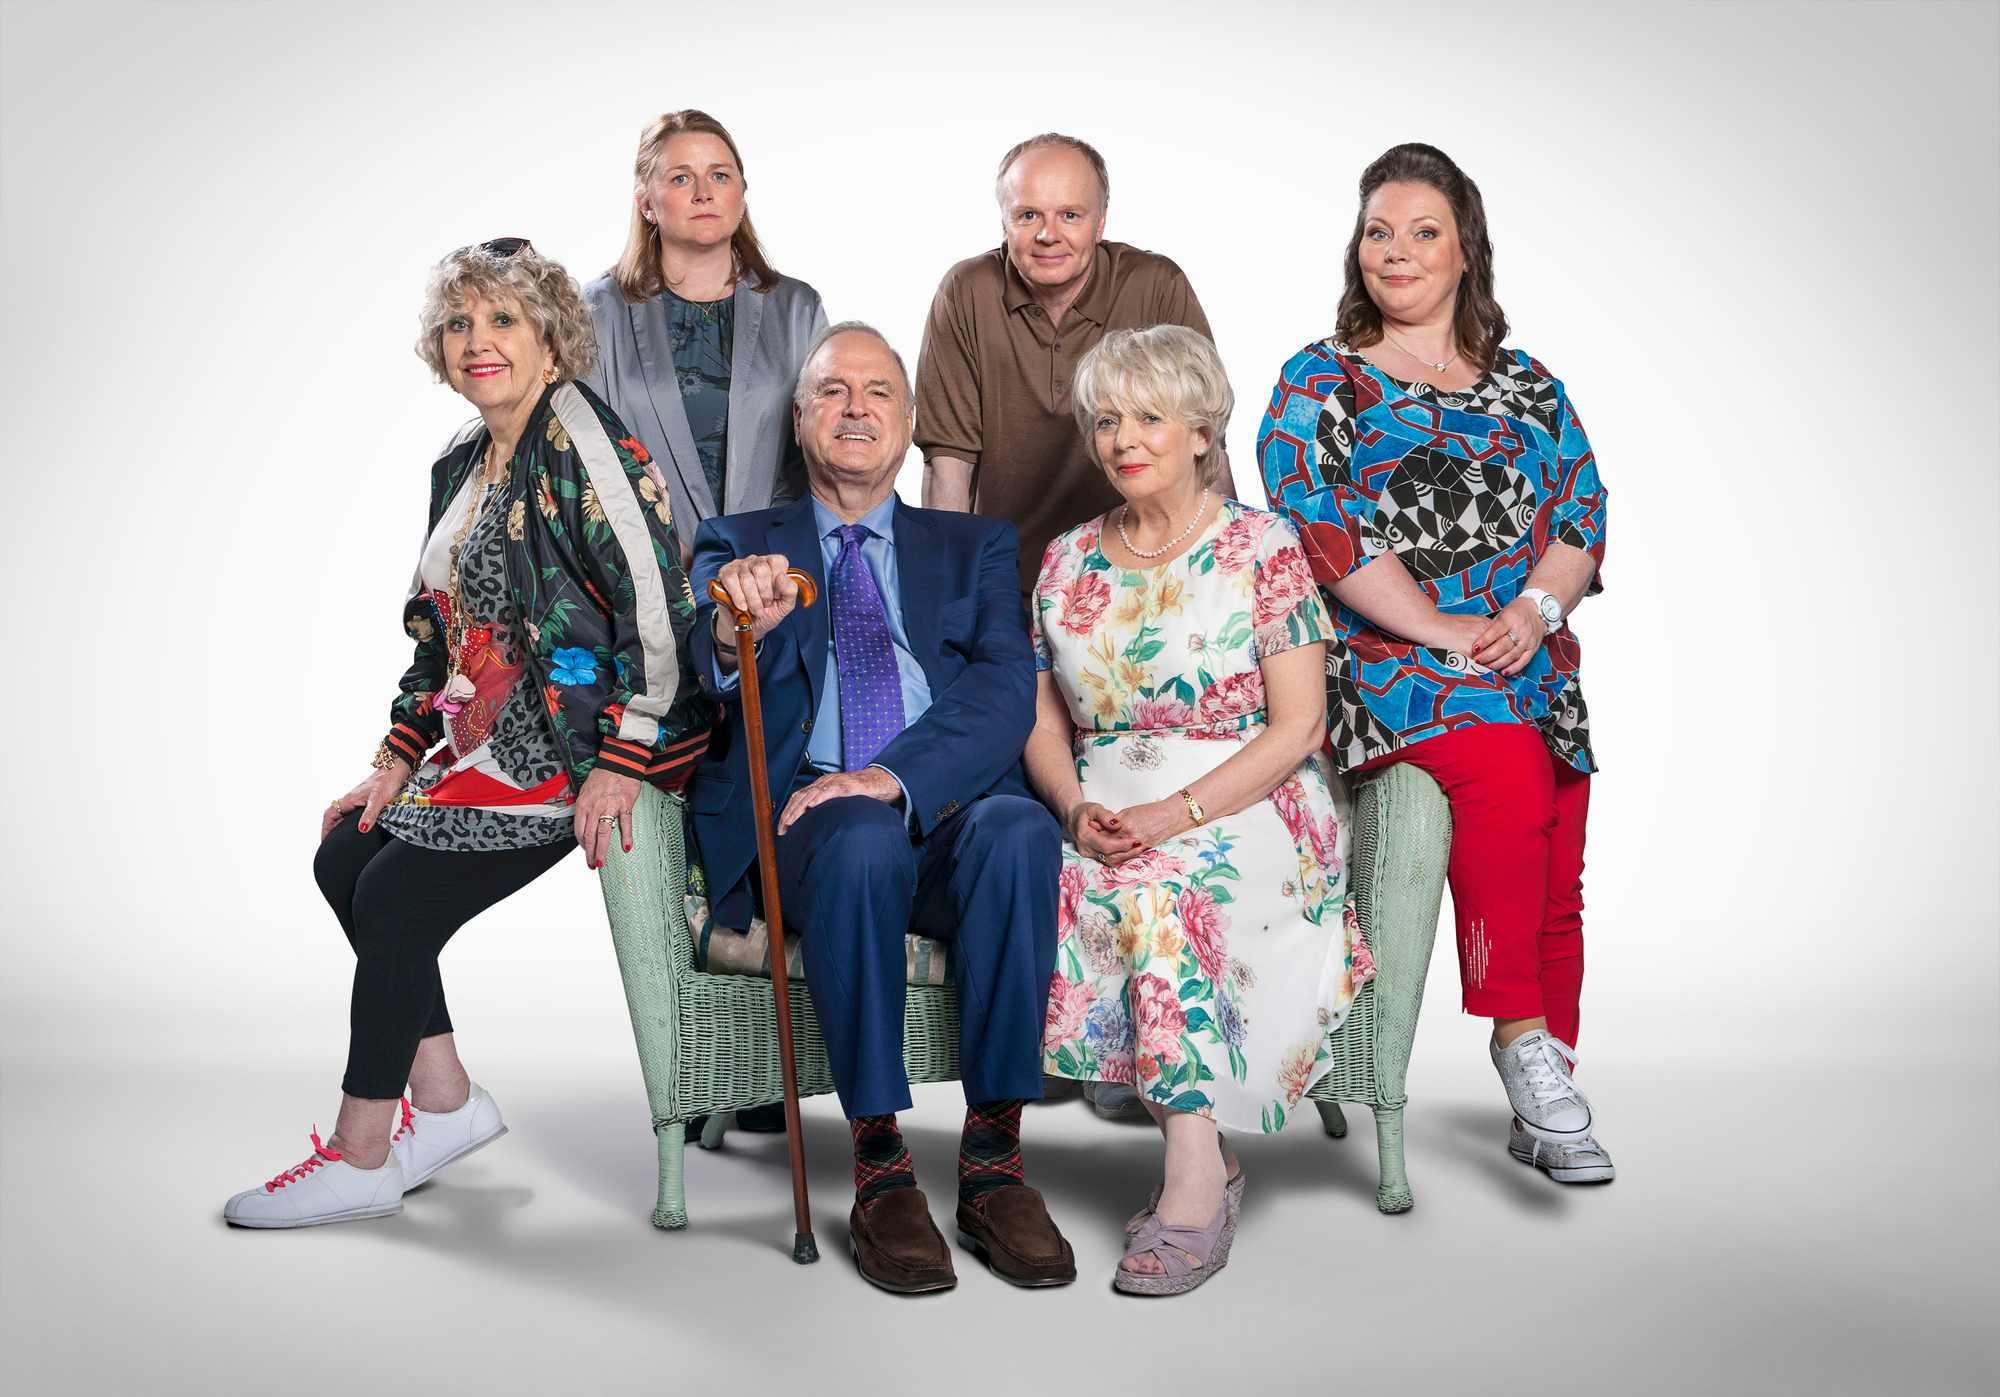 Cast of Hold The Sunset - Mrs Gale (ANNE REID), Wendy (ROSIE CAVALIERO), Phil (JOHN CLEESE), Roger (JASON WATKINS), Edith (ALISON STEADMAN), Sandra (JOANNA SCANLAN) - (BBC, SD)